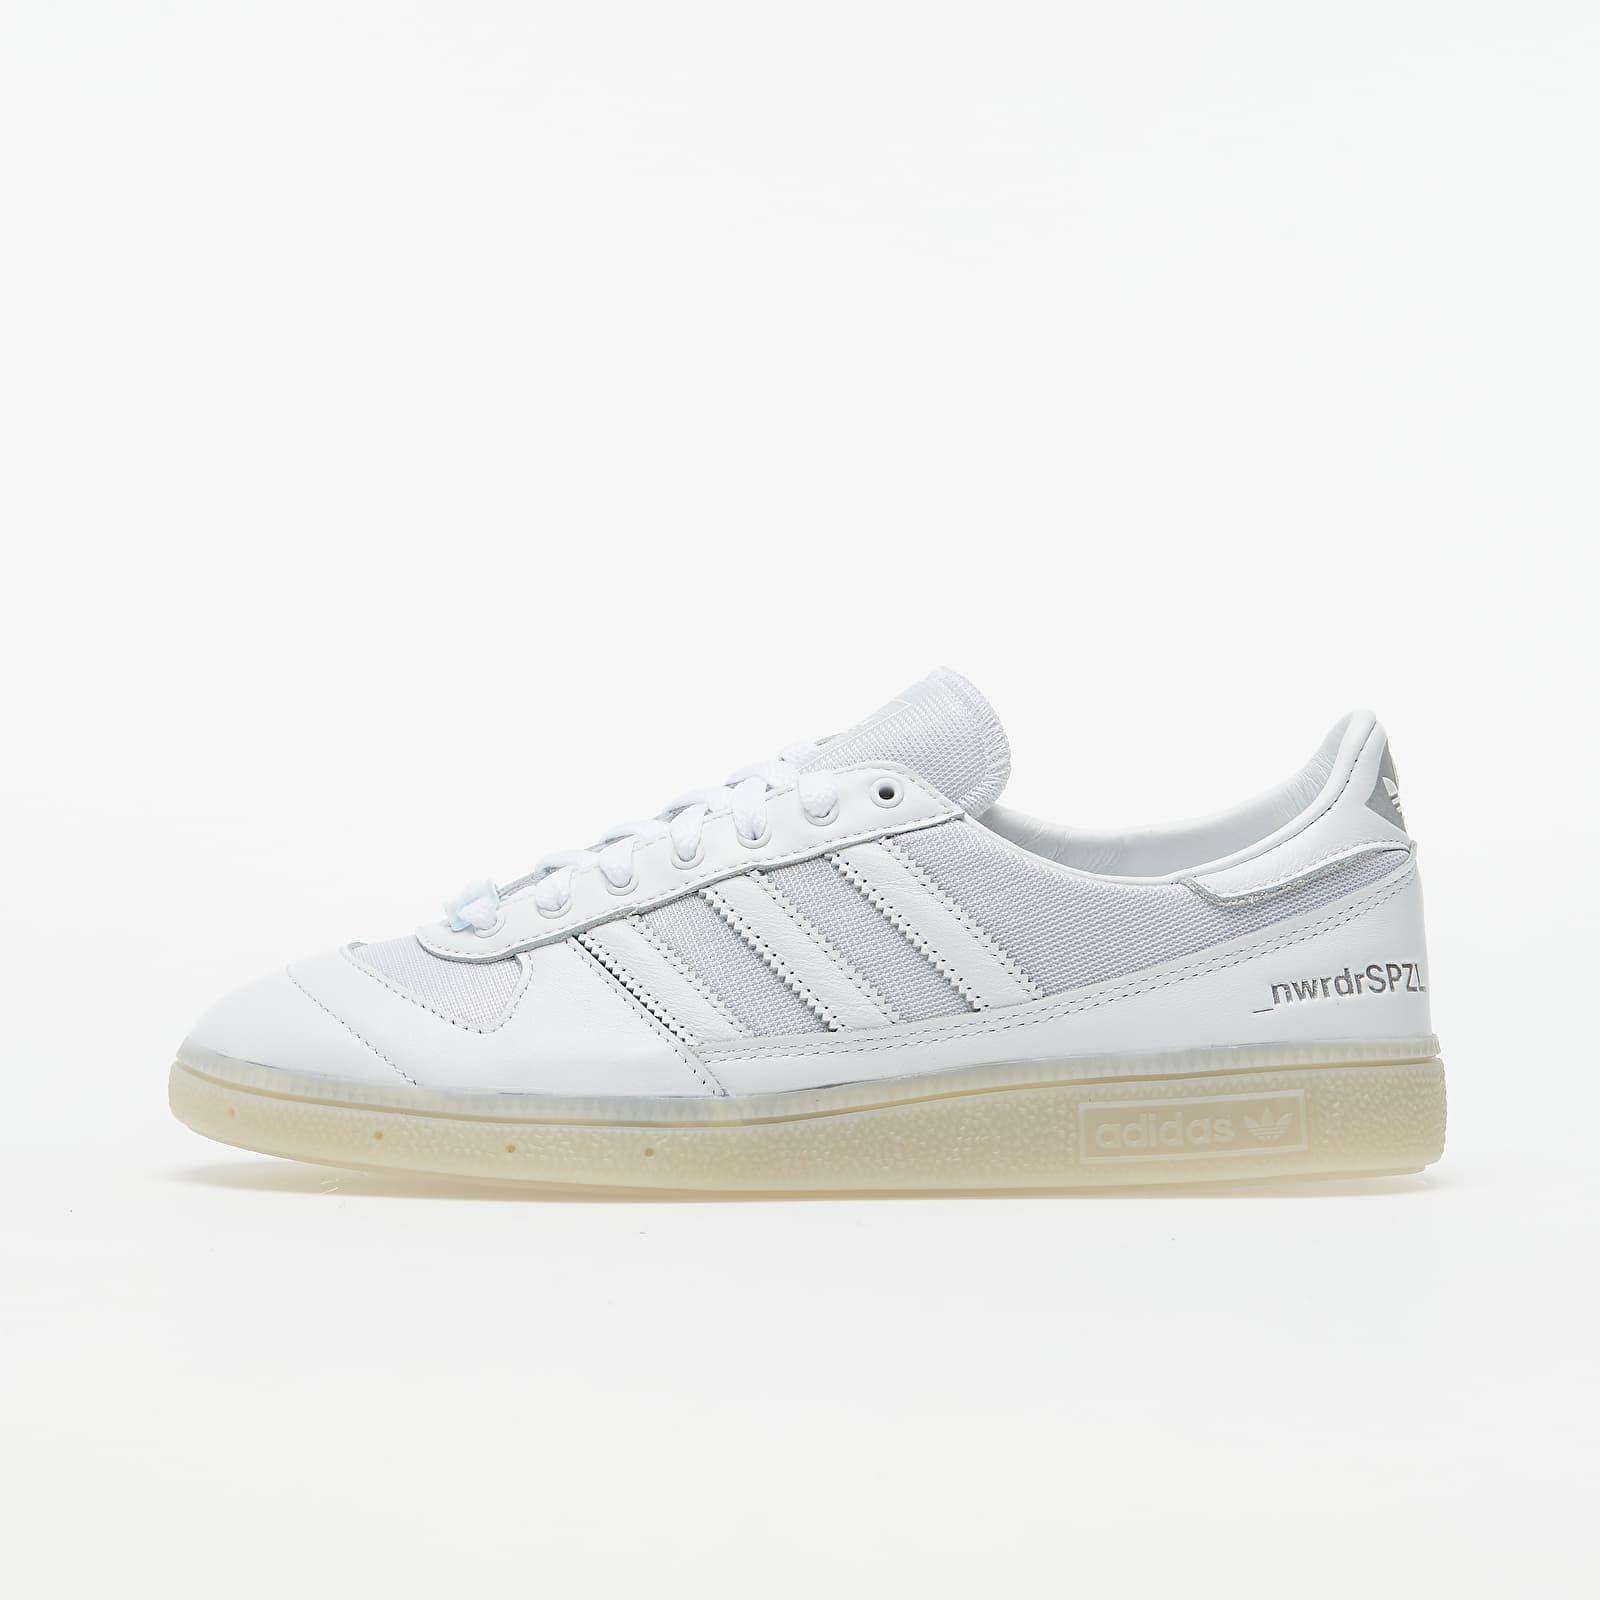 adidas WILSY SPZL Ftwr White/ Ftwr White/ Grey Three EUR 46